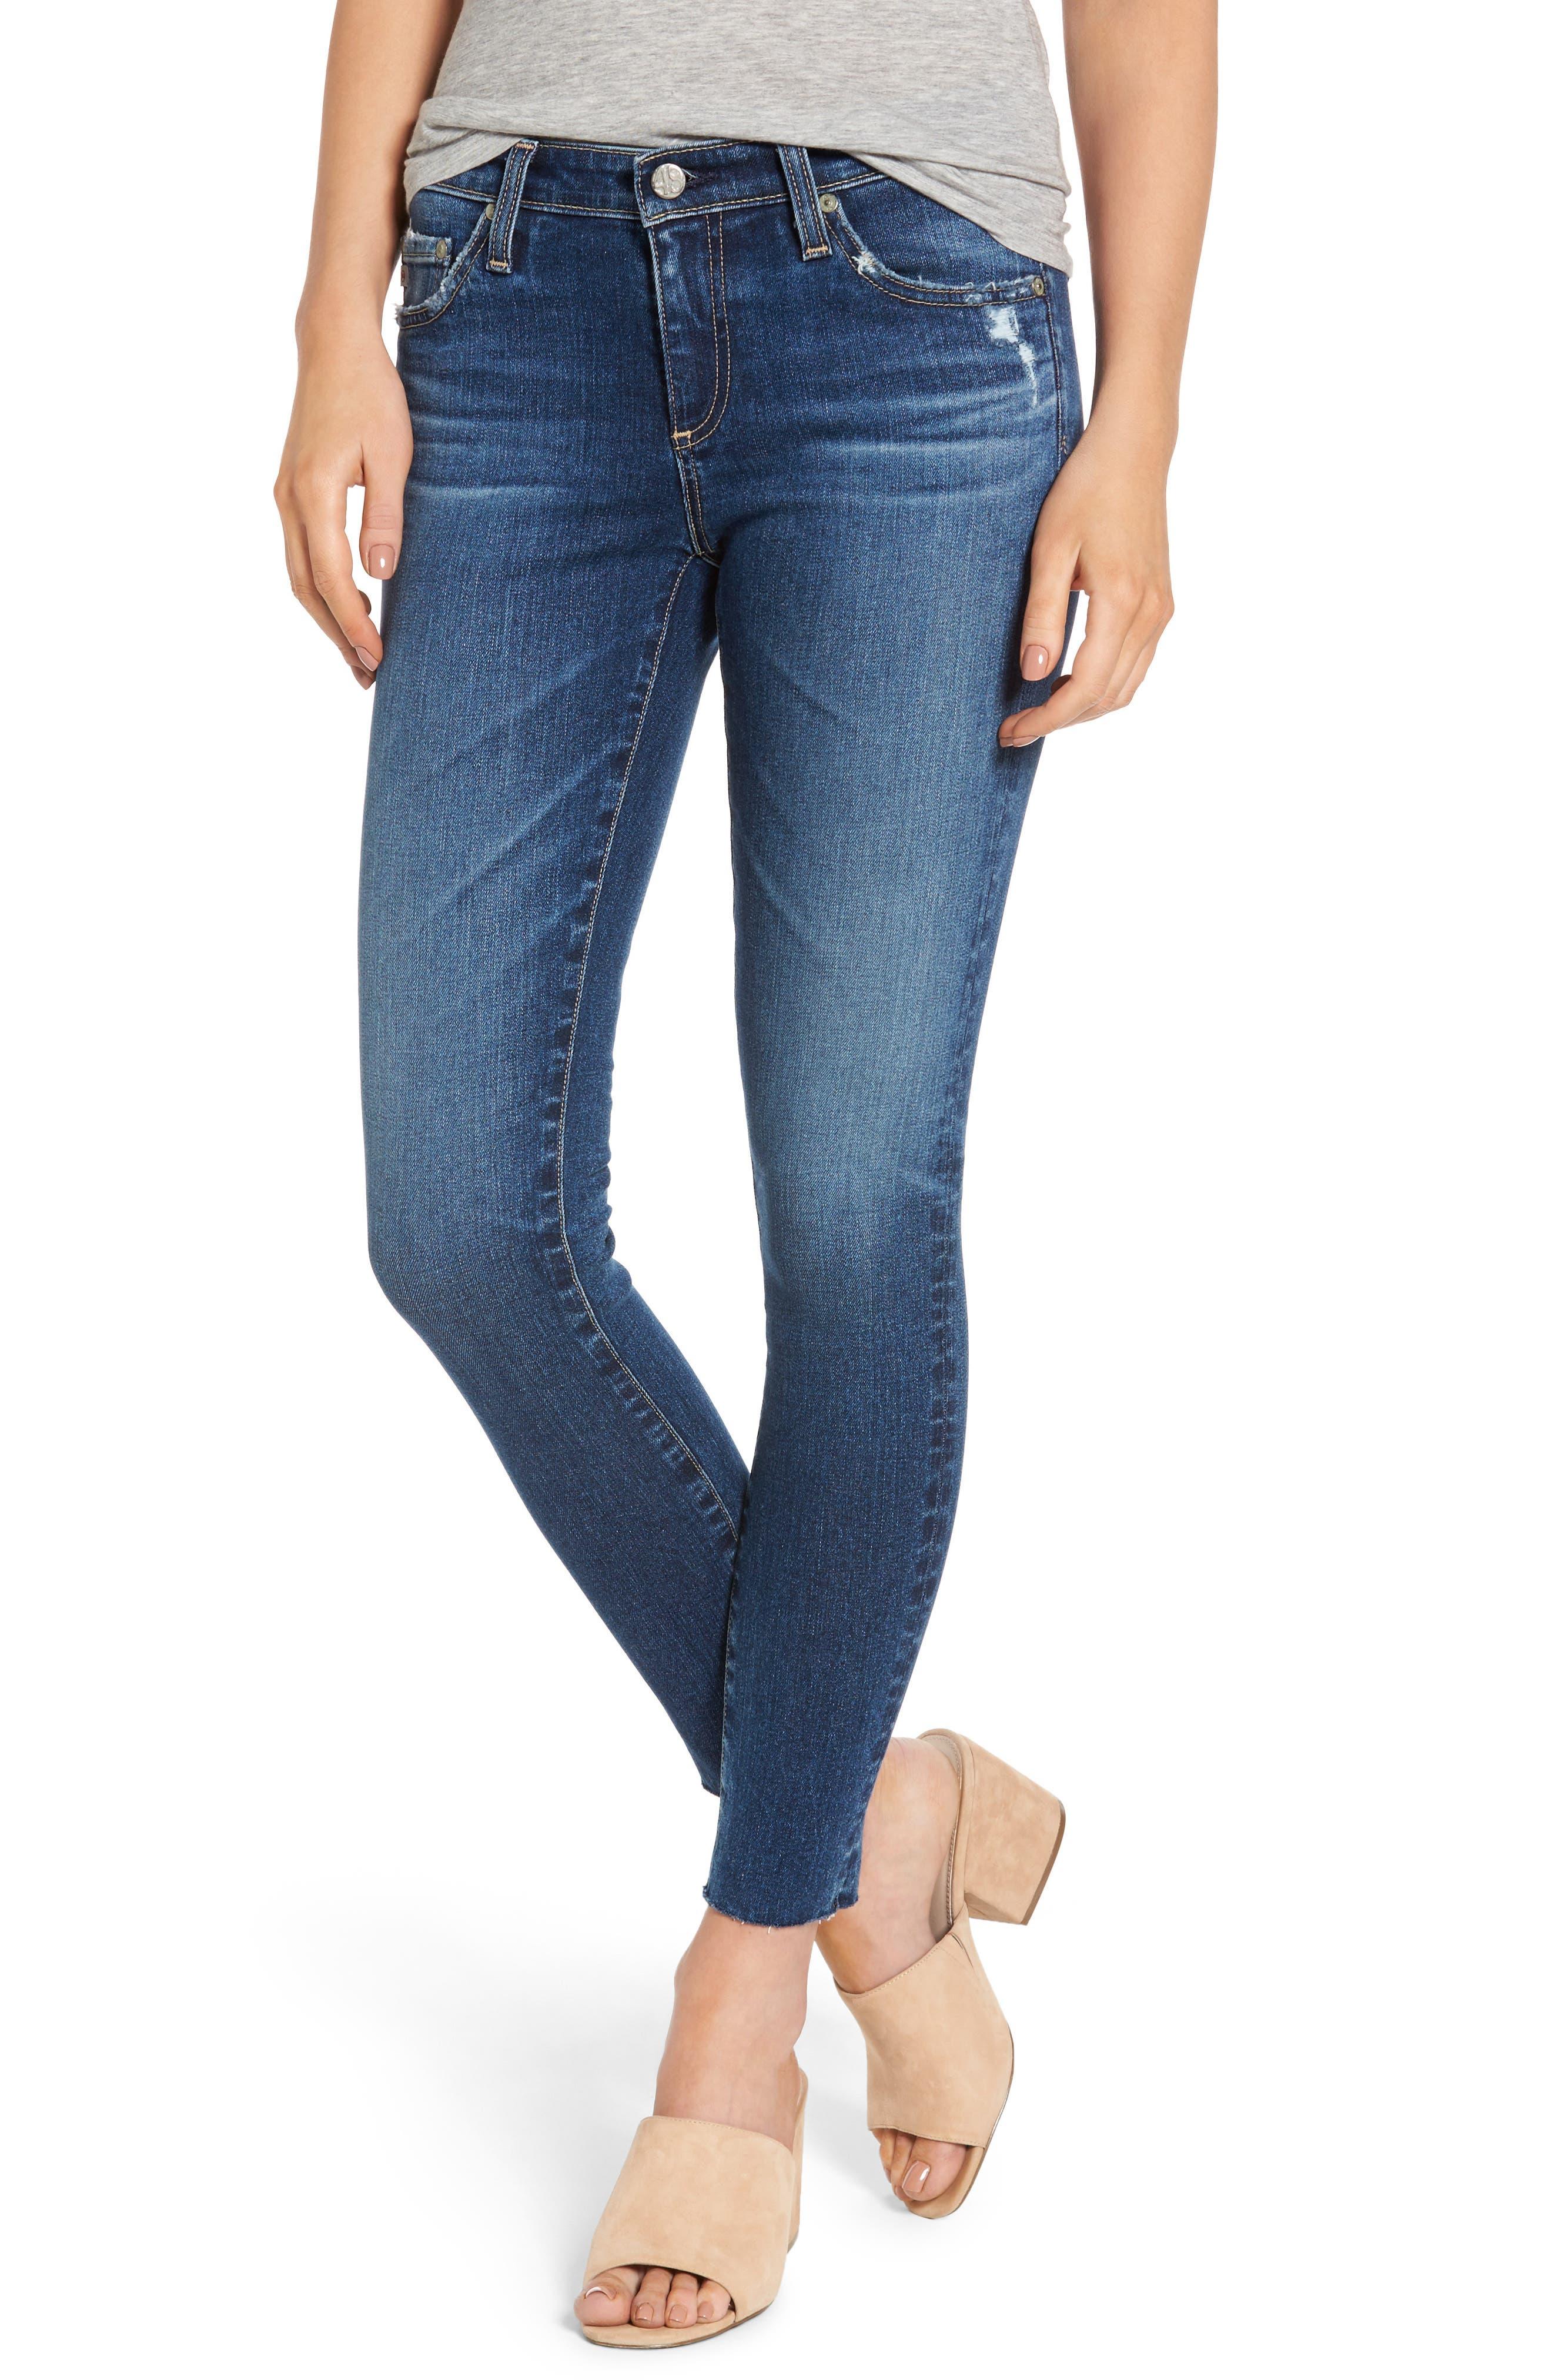 Alternate Image 1 Selected - AG The Legging Raw Hem Ankle Skinny Jeans (12 Years Blue Dust)